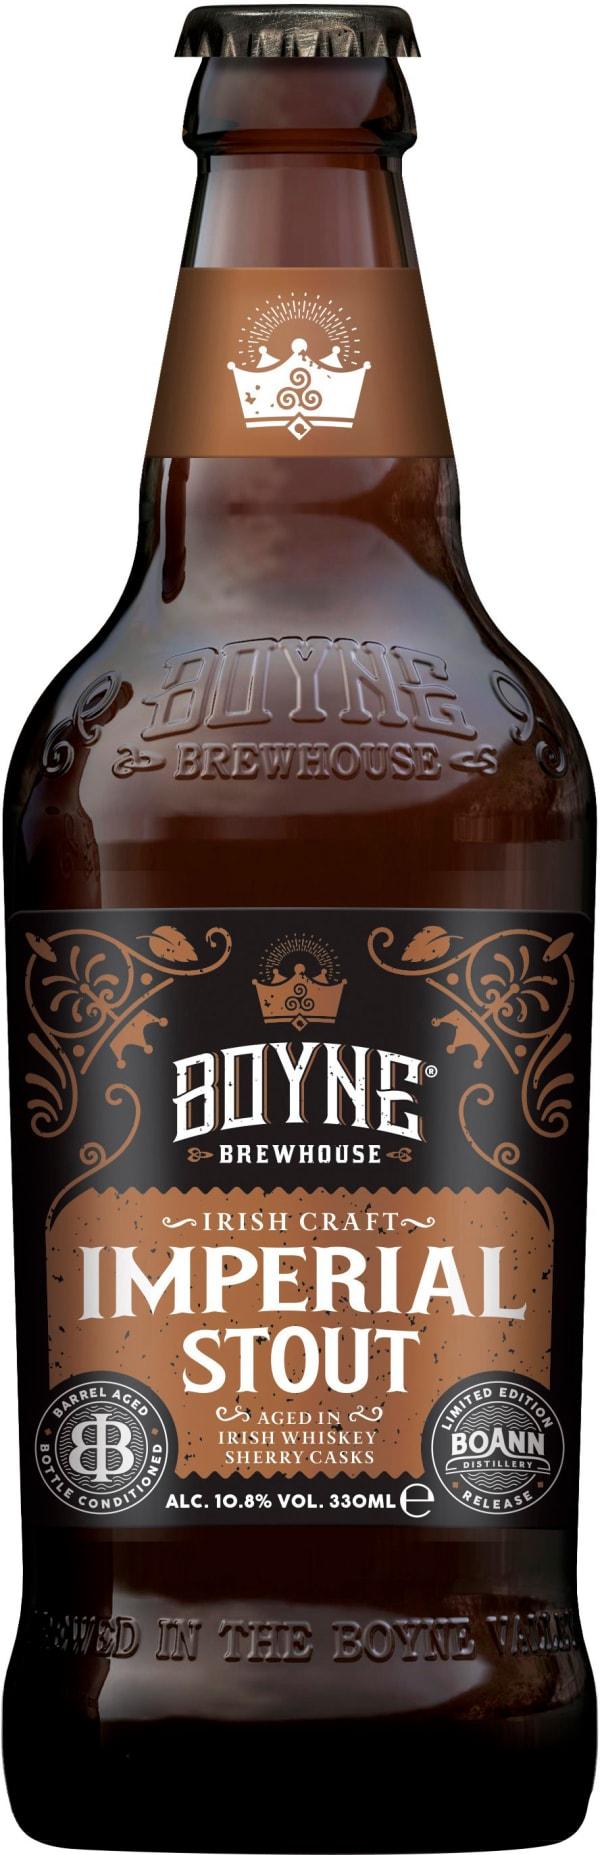 Boyne Imperial Stout Sherry Cask